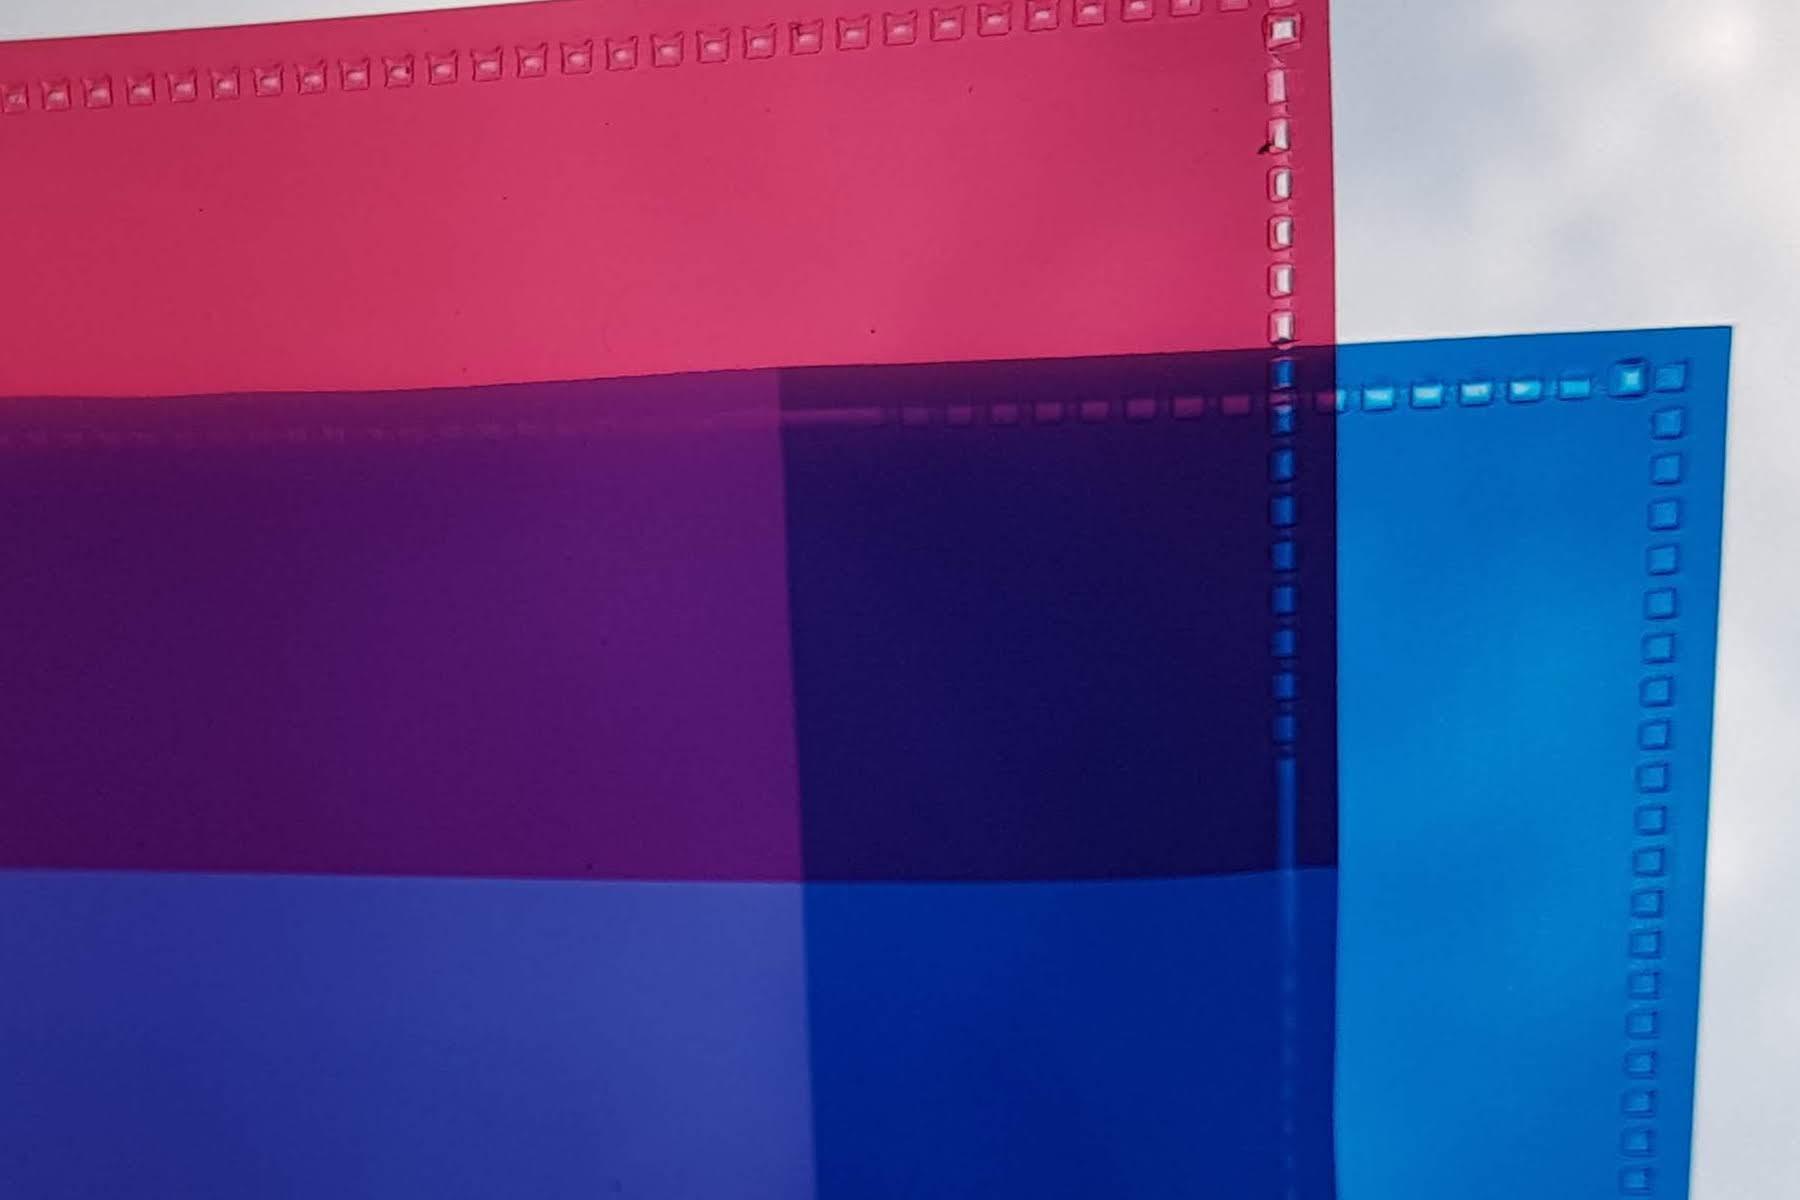 foliji-rdeca-modra-11-22